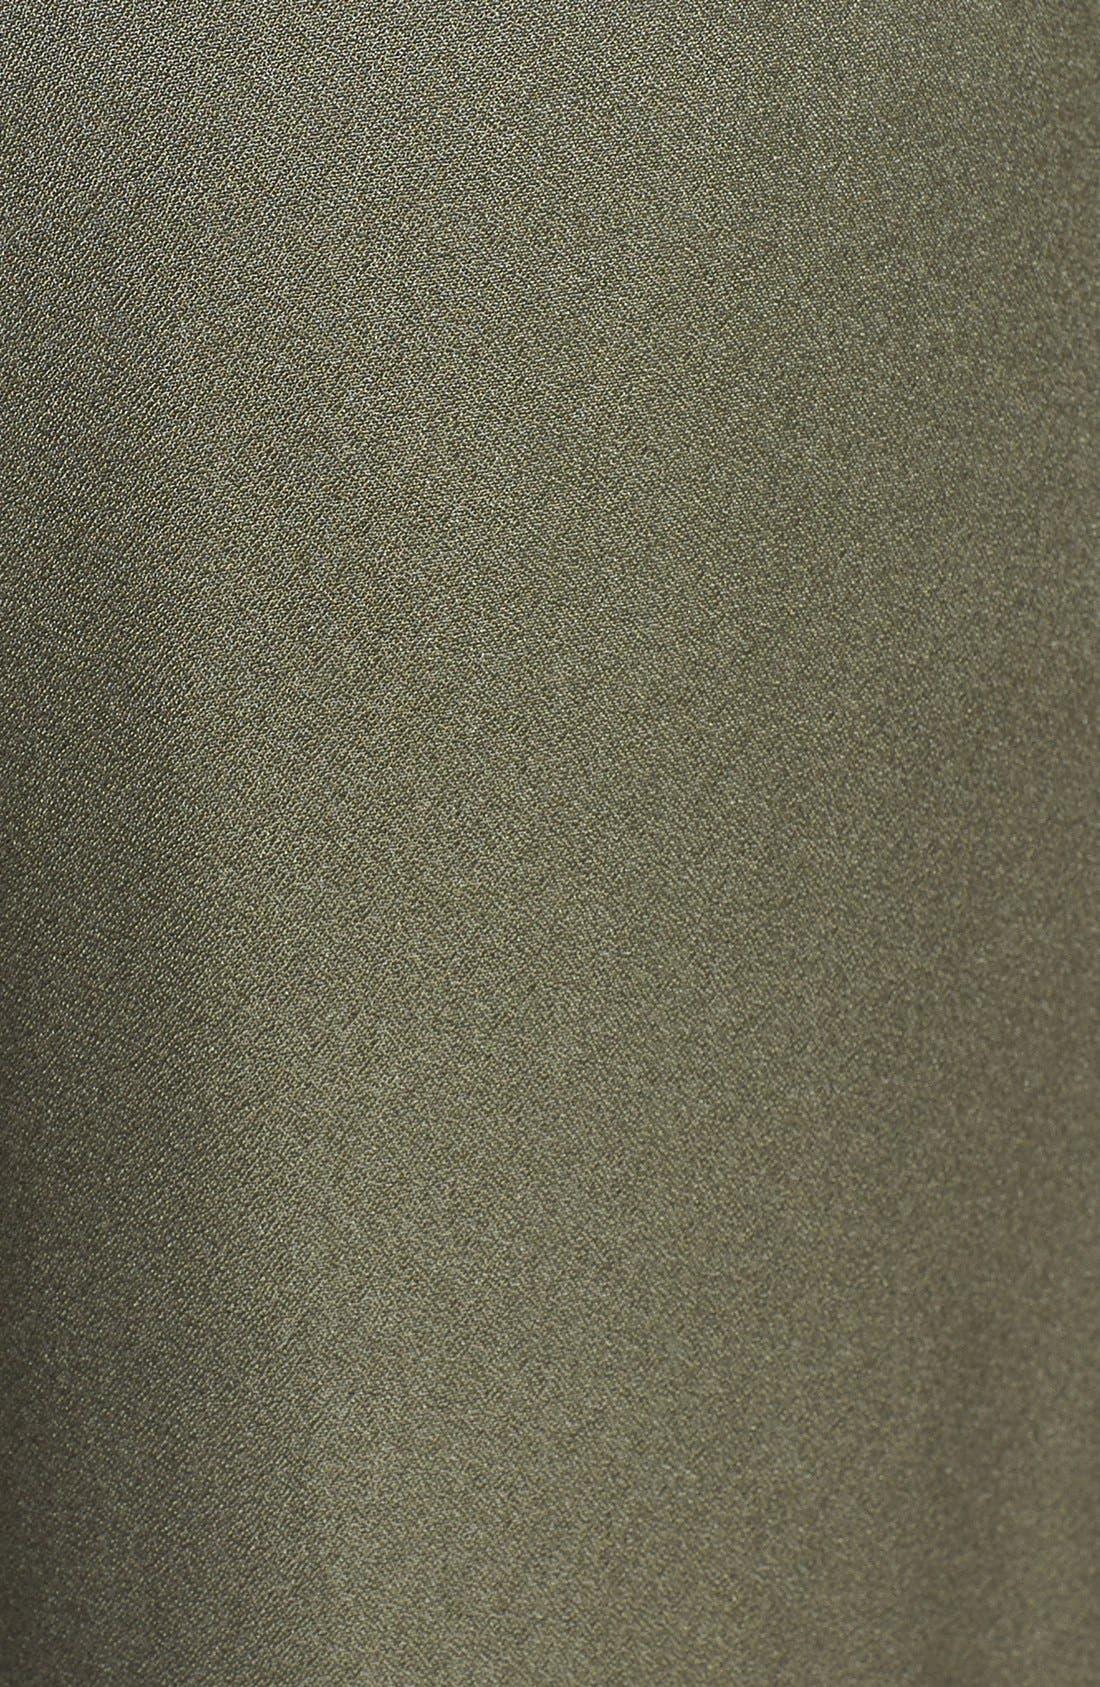 Alternate Image 3  - Joie 'Maxi' Tapered Leg Crepe Pants